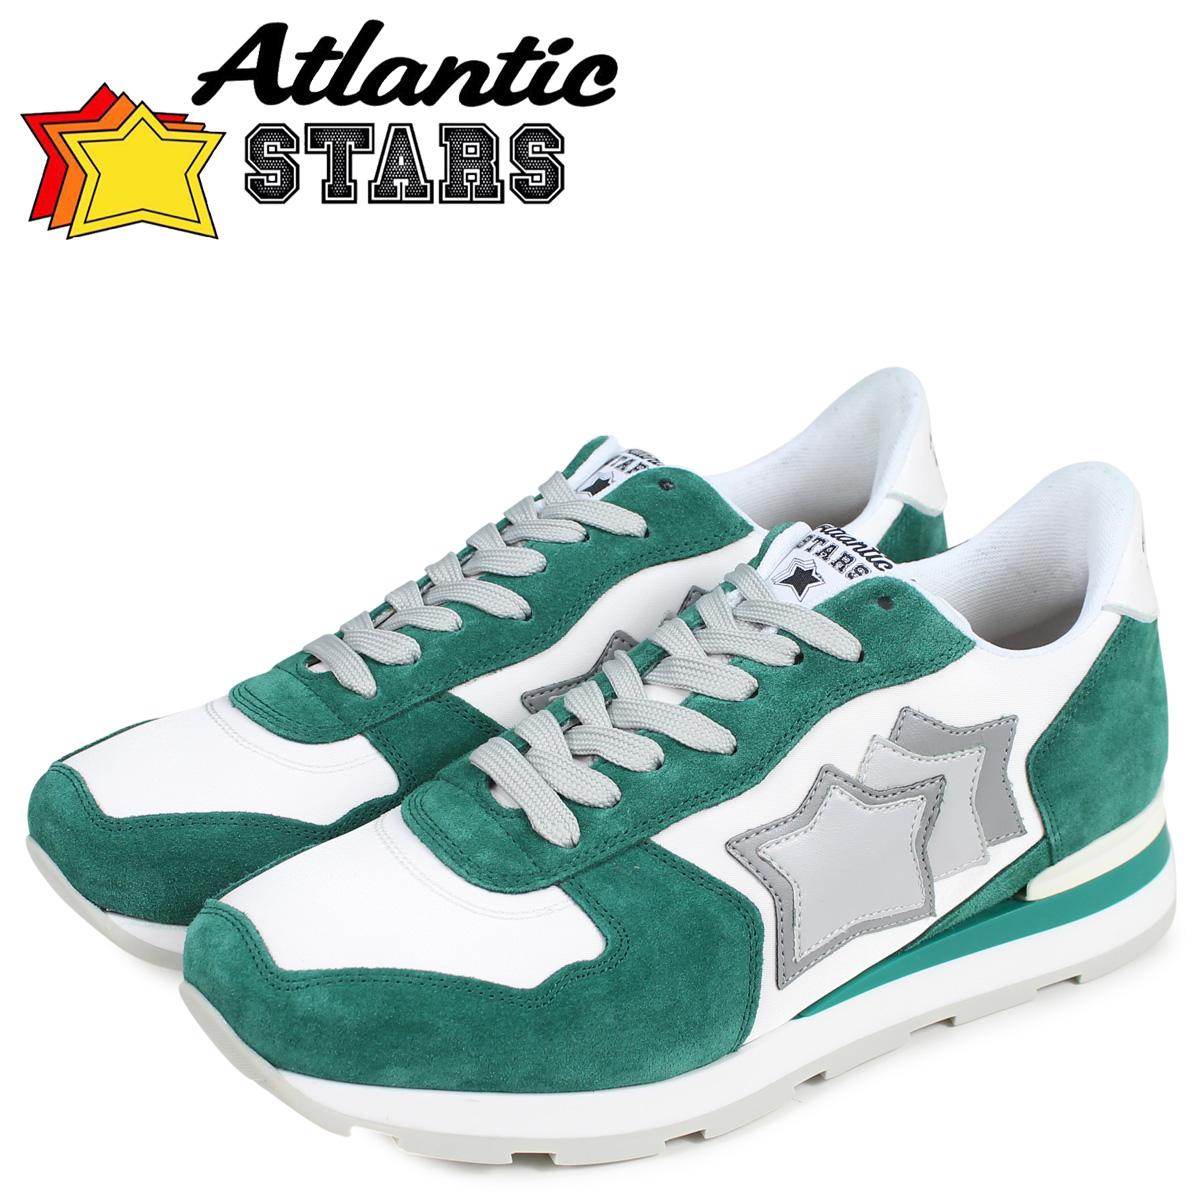 Atlantic STARS アトランティックスターズ アンタレス スニーカー メンズ ANTARES グリーン BVB-13B